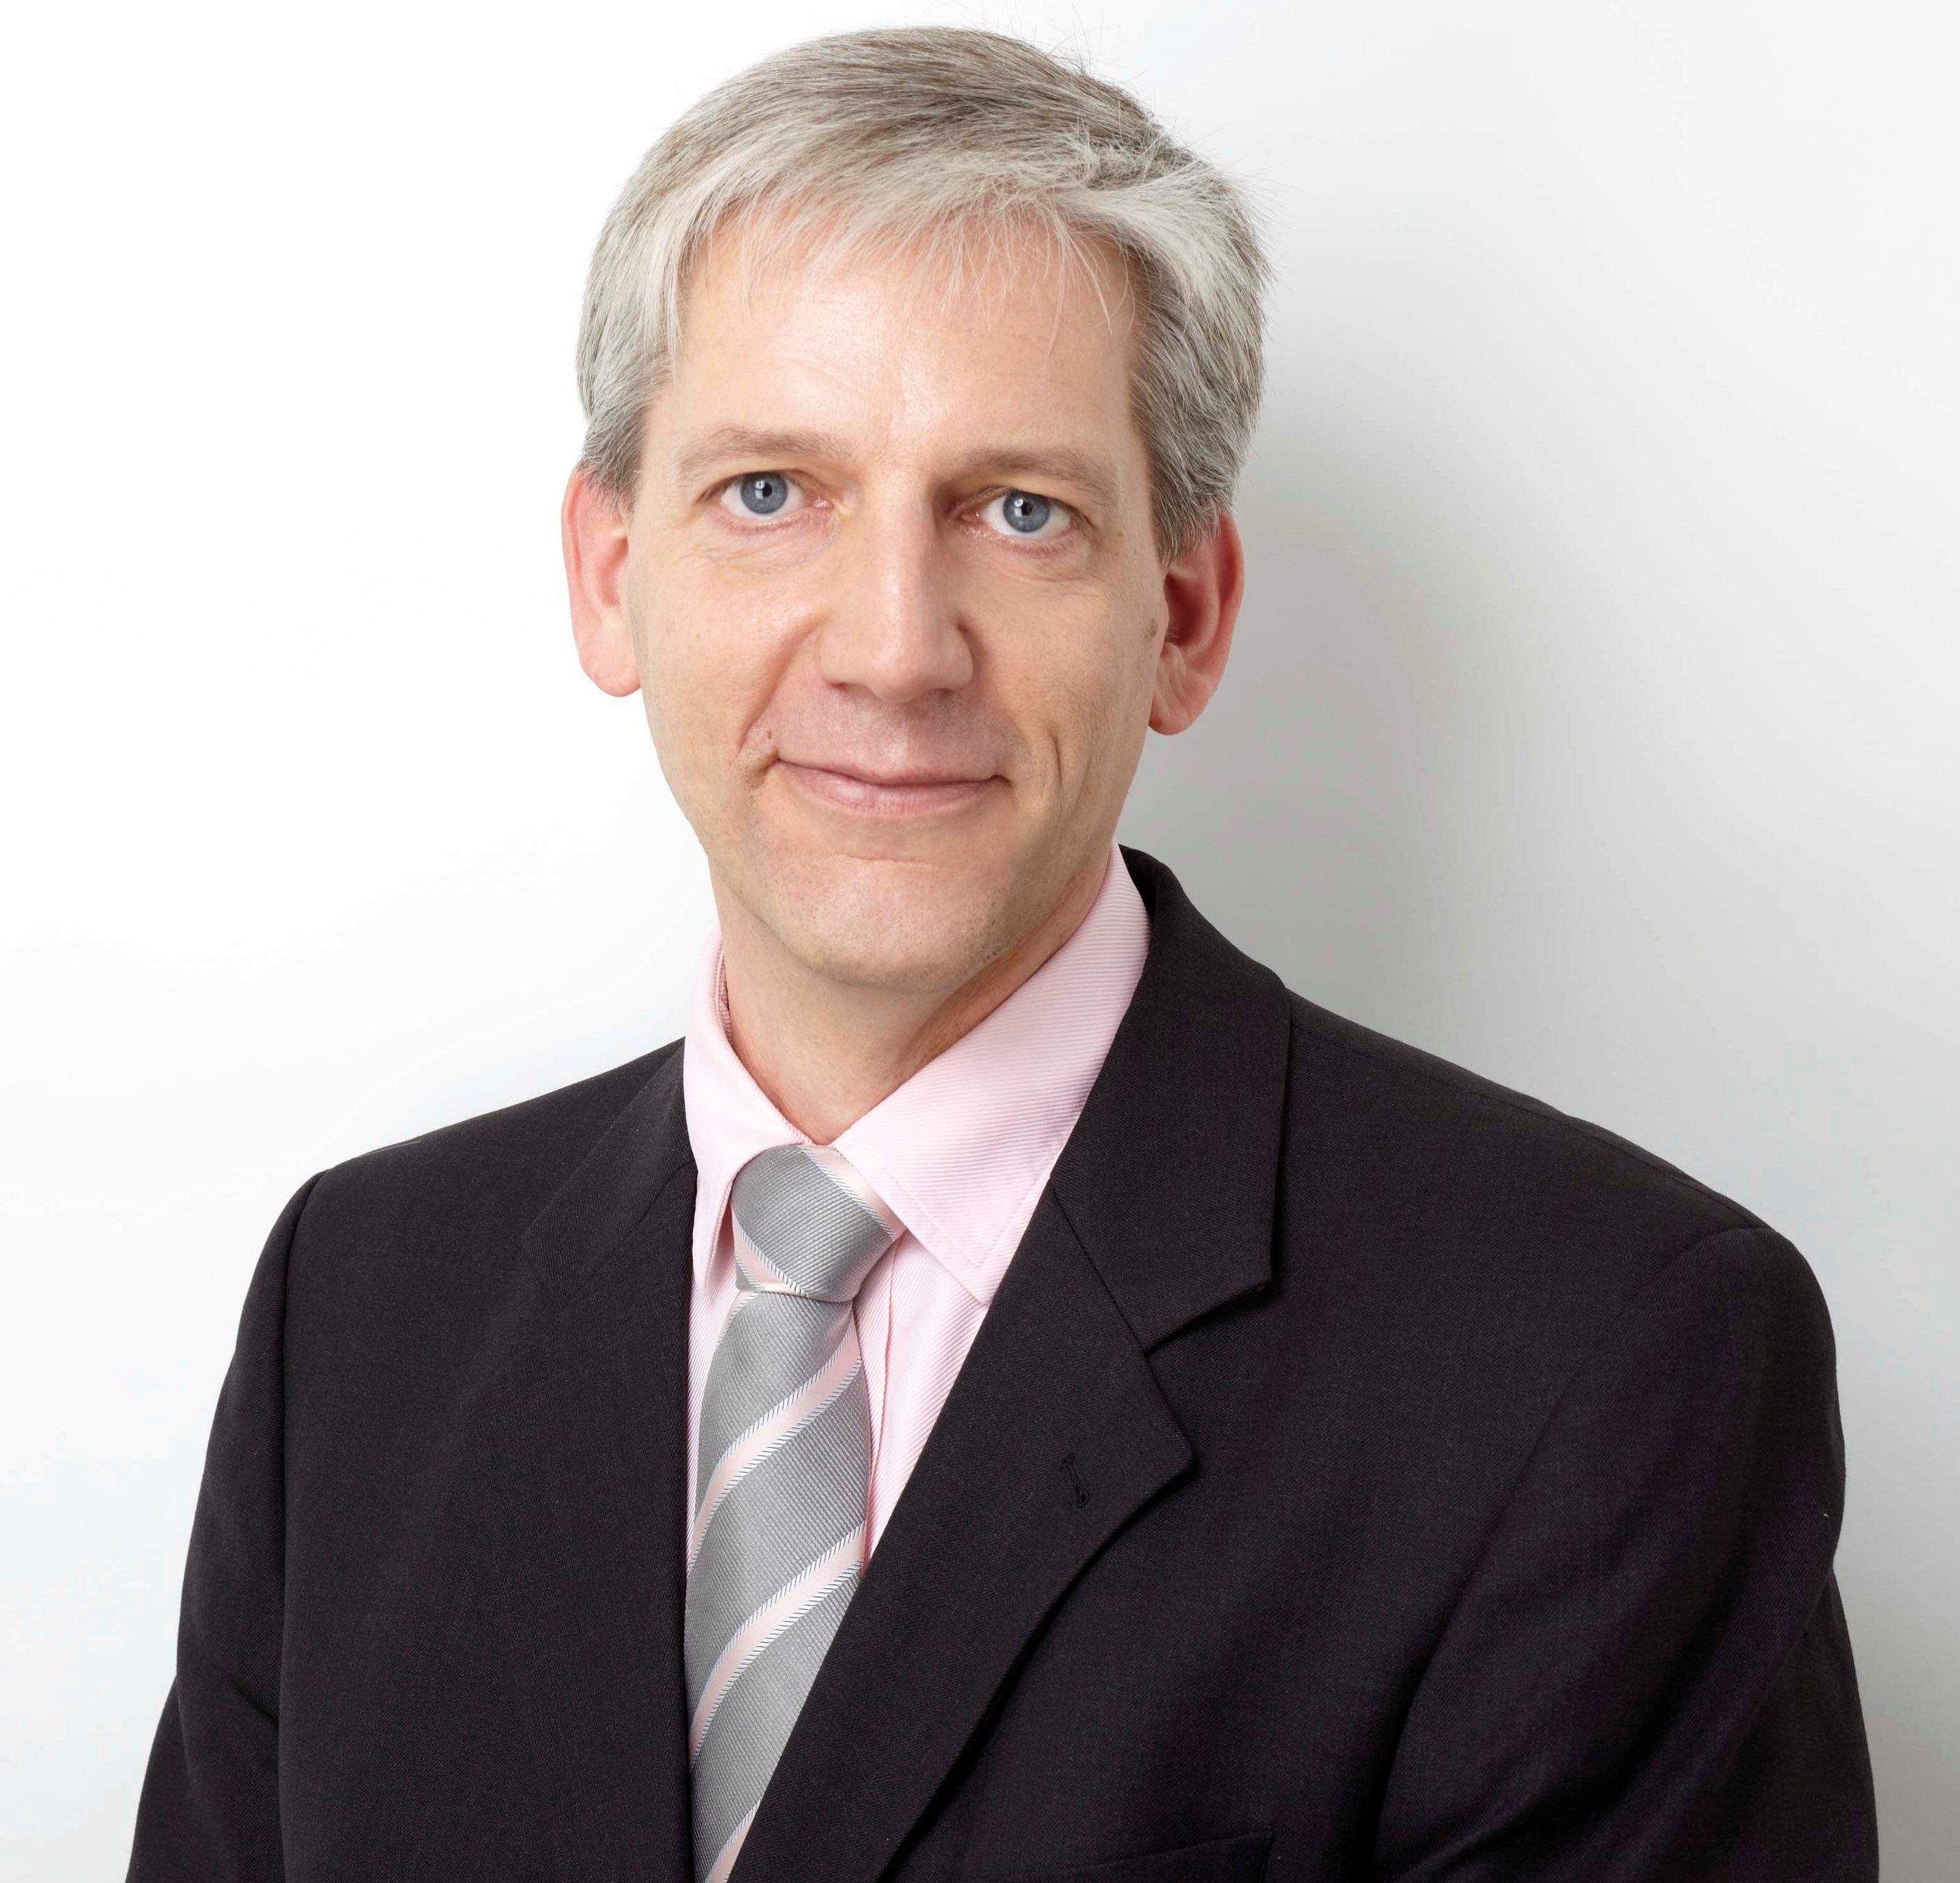 Kücheninsel Olaf Schuster ~ société générale lanciert den veritas risk at work index